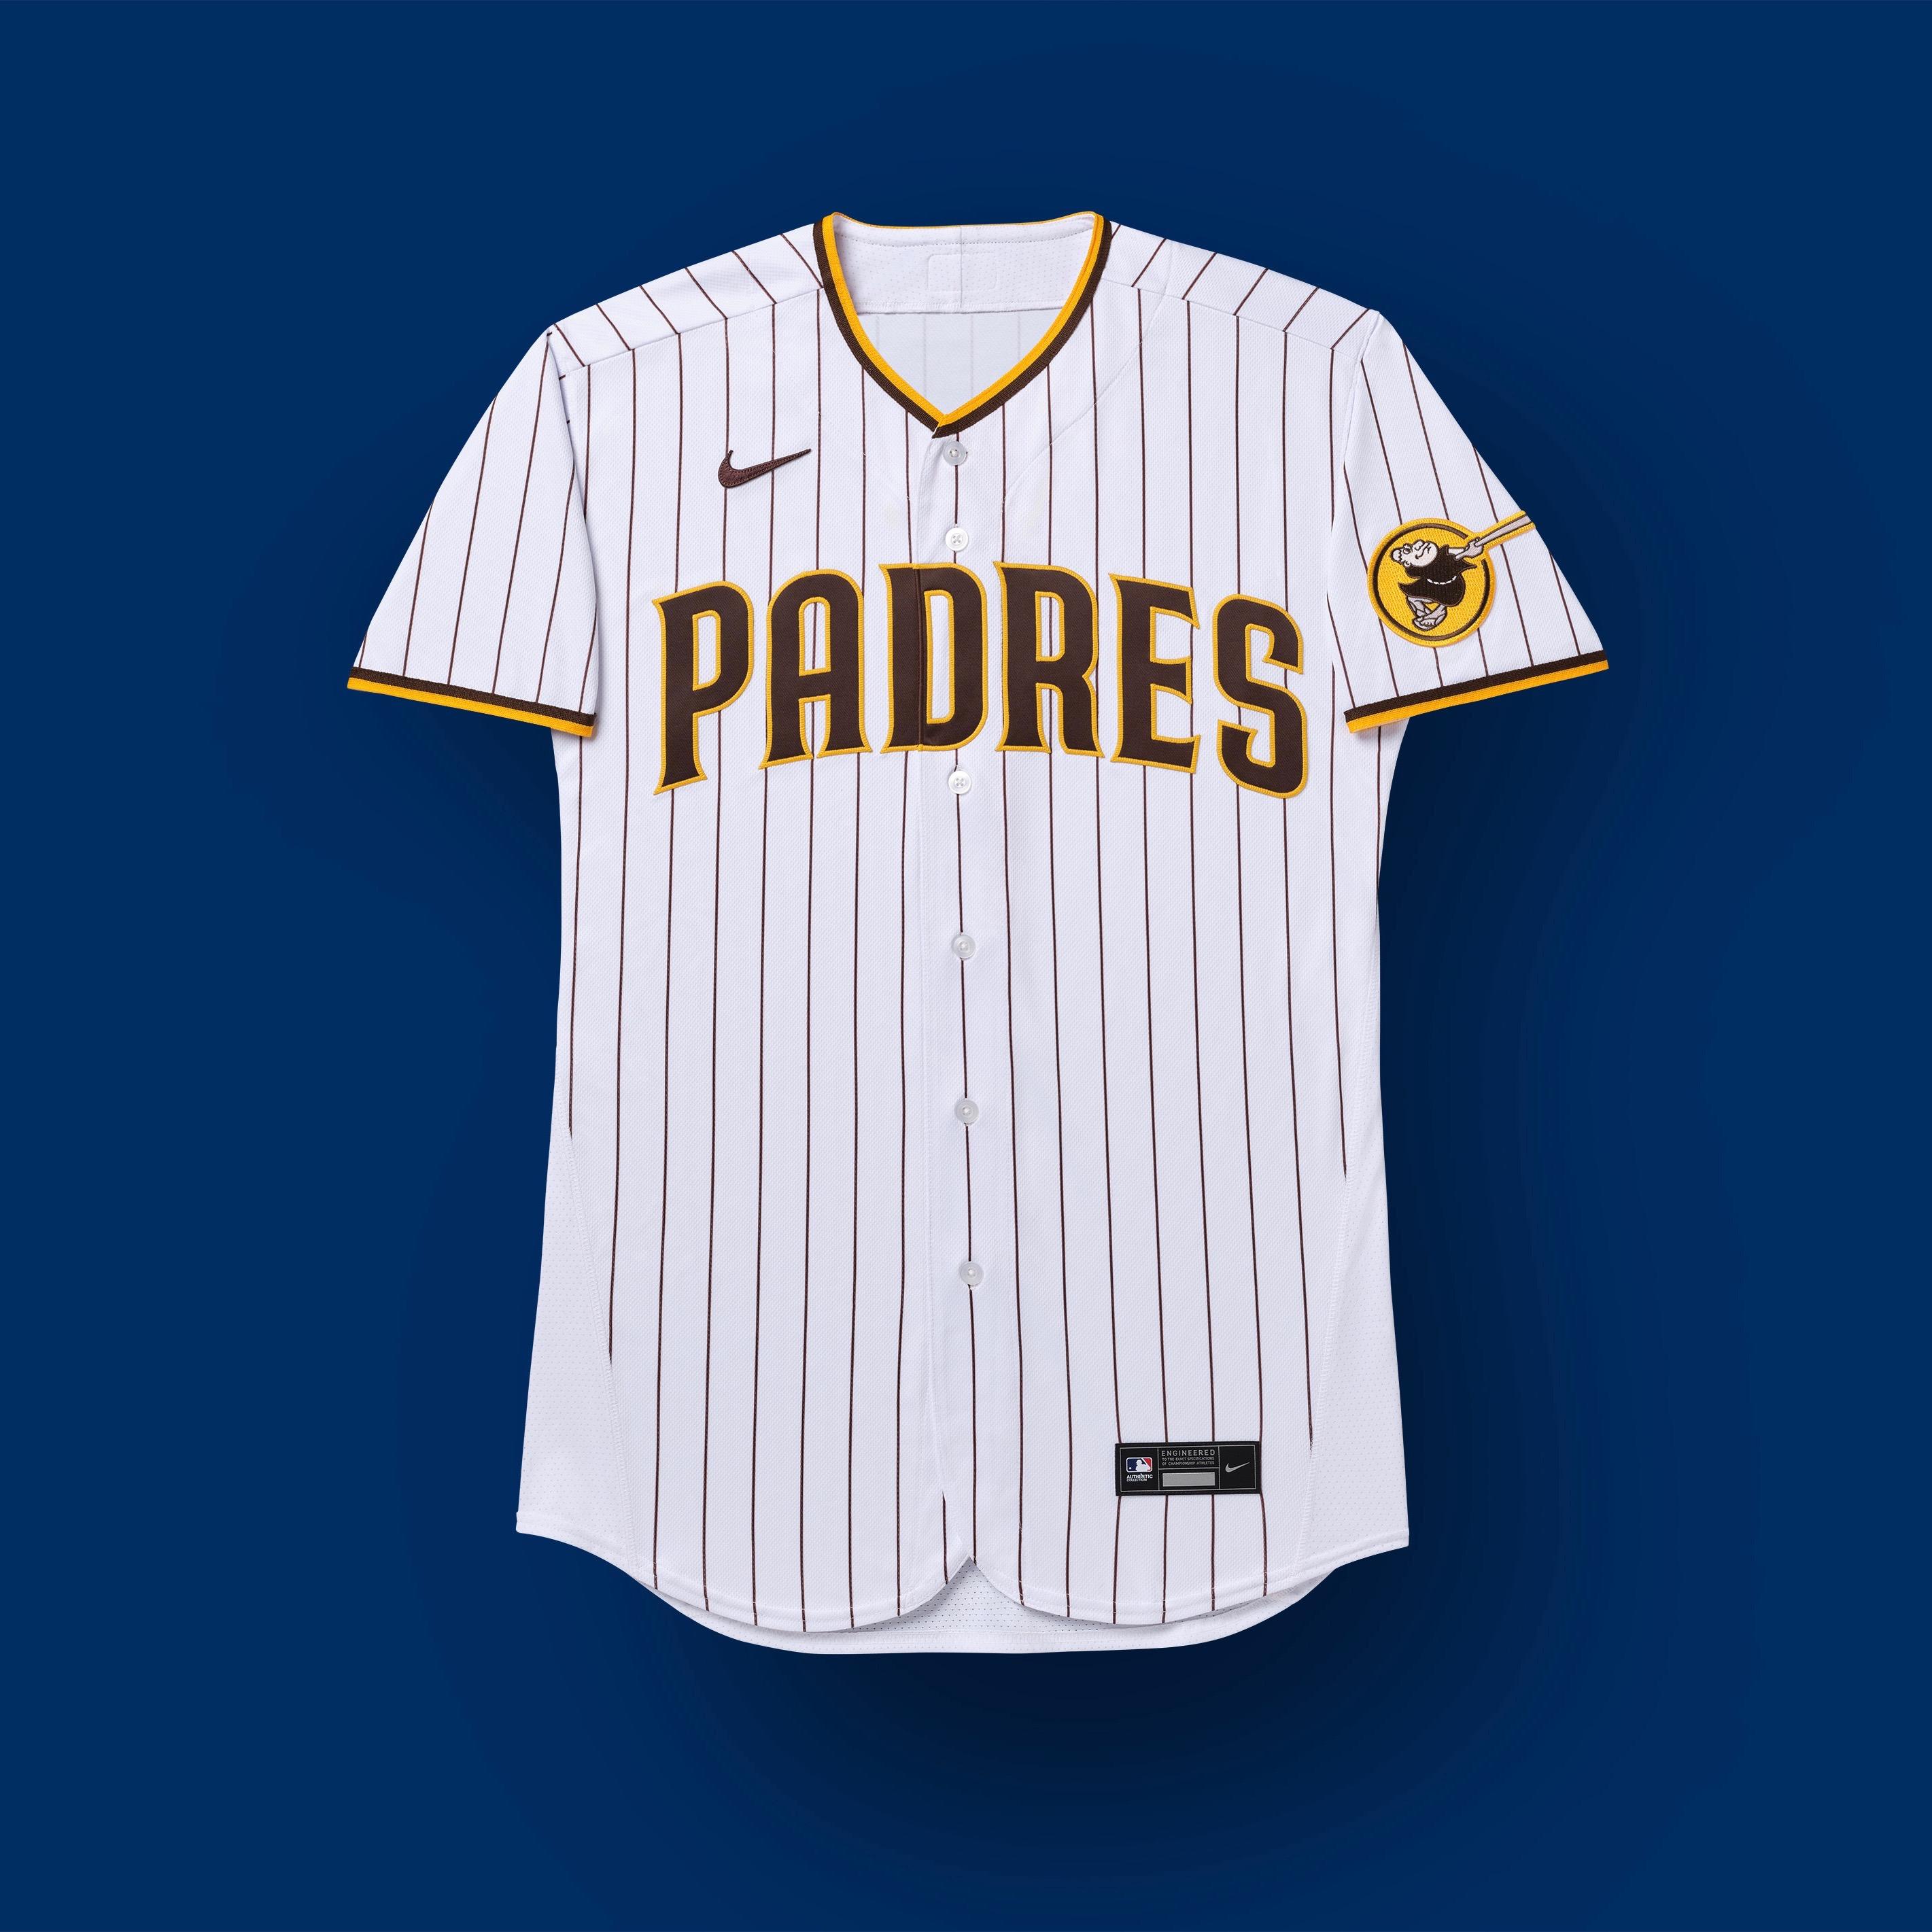 uniformes san diego padres 2020